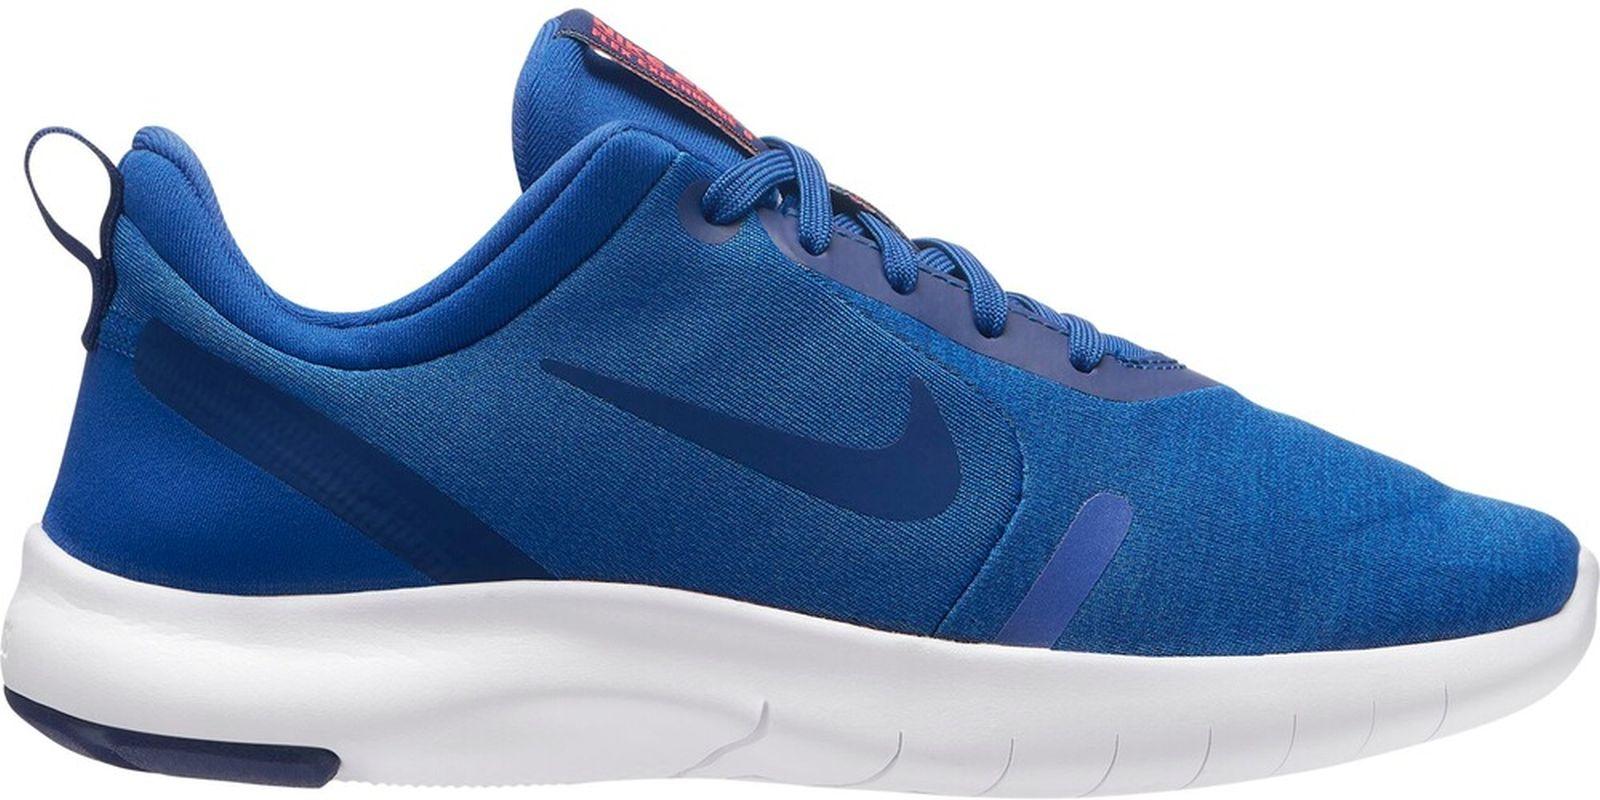 Details zu Nike Kinder Laufschuhe NIKE FLEX EXPERIENCE RN 8 (GS) blau AQ2246 400